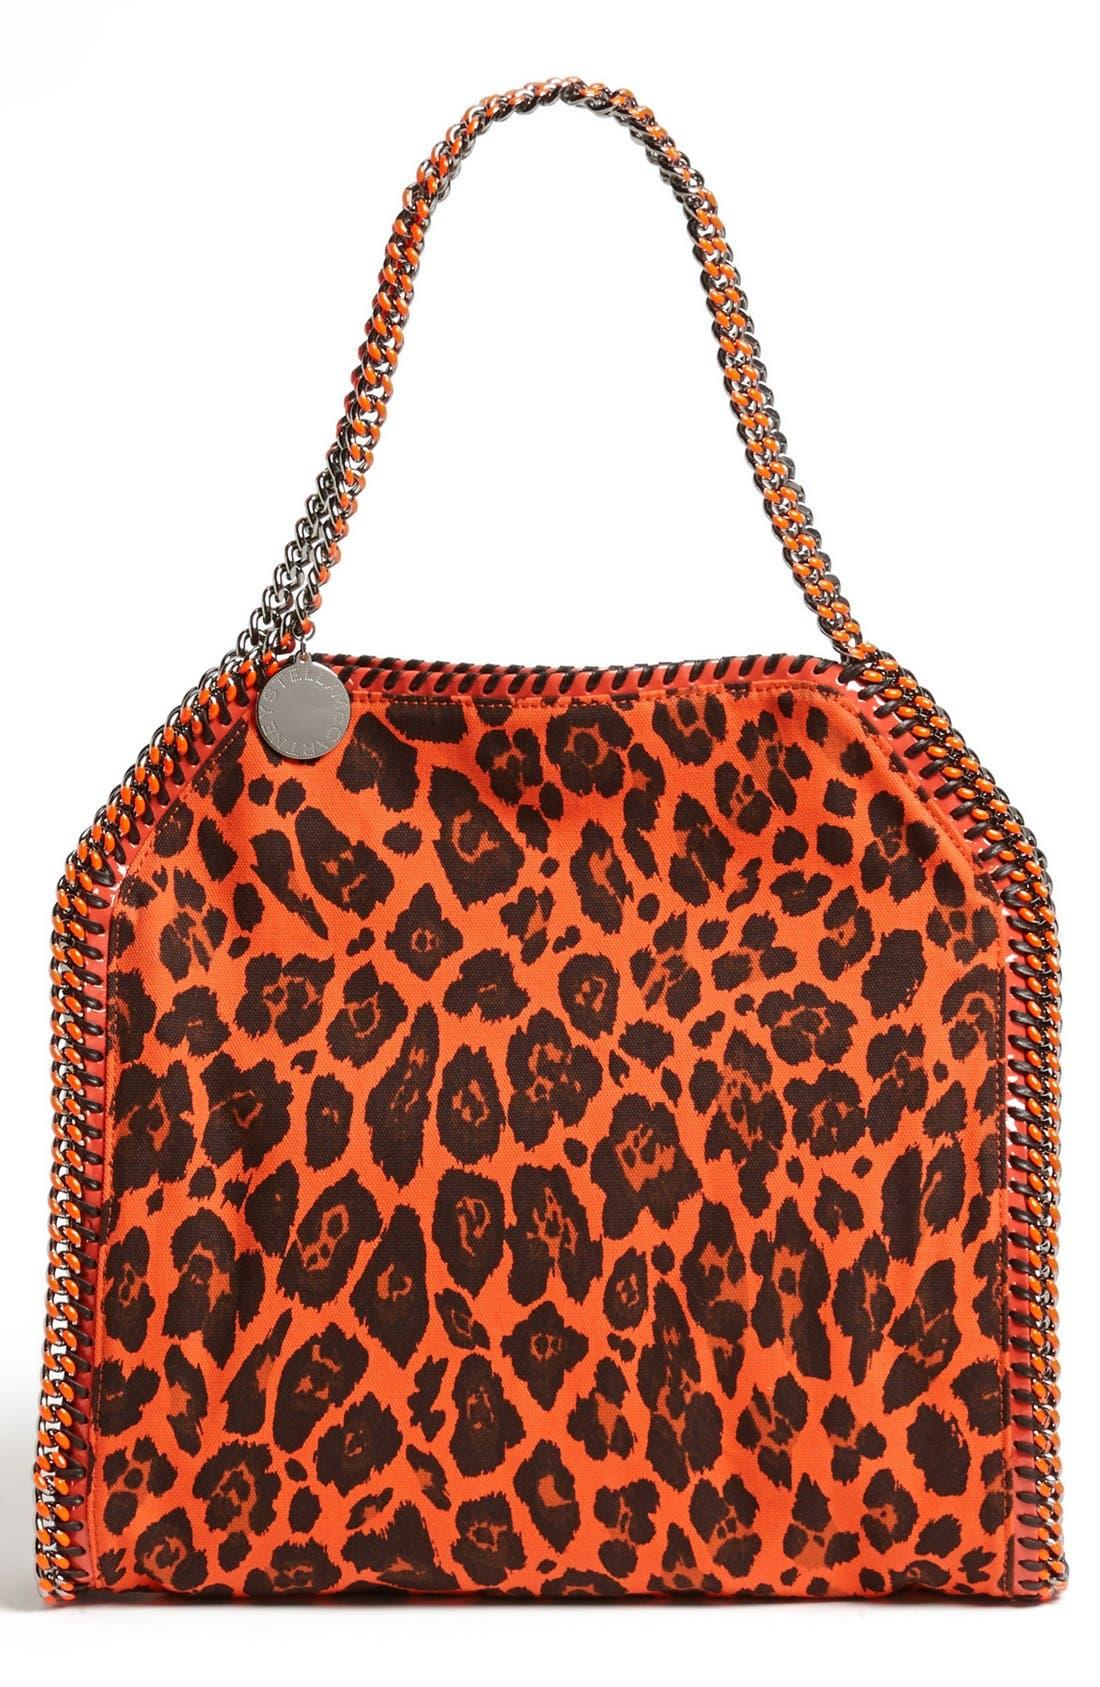 Alternate Image 1 Selected - Stella McCartney 'Falabella -Small' Leopard Print Tote